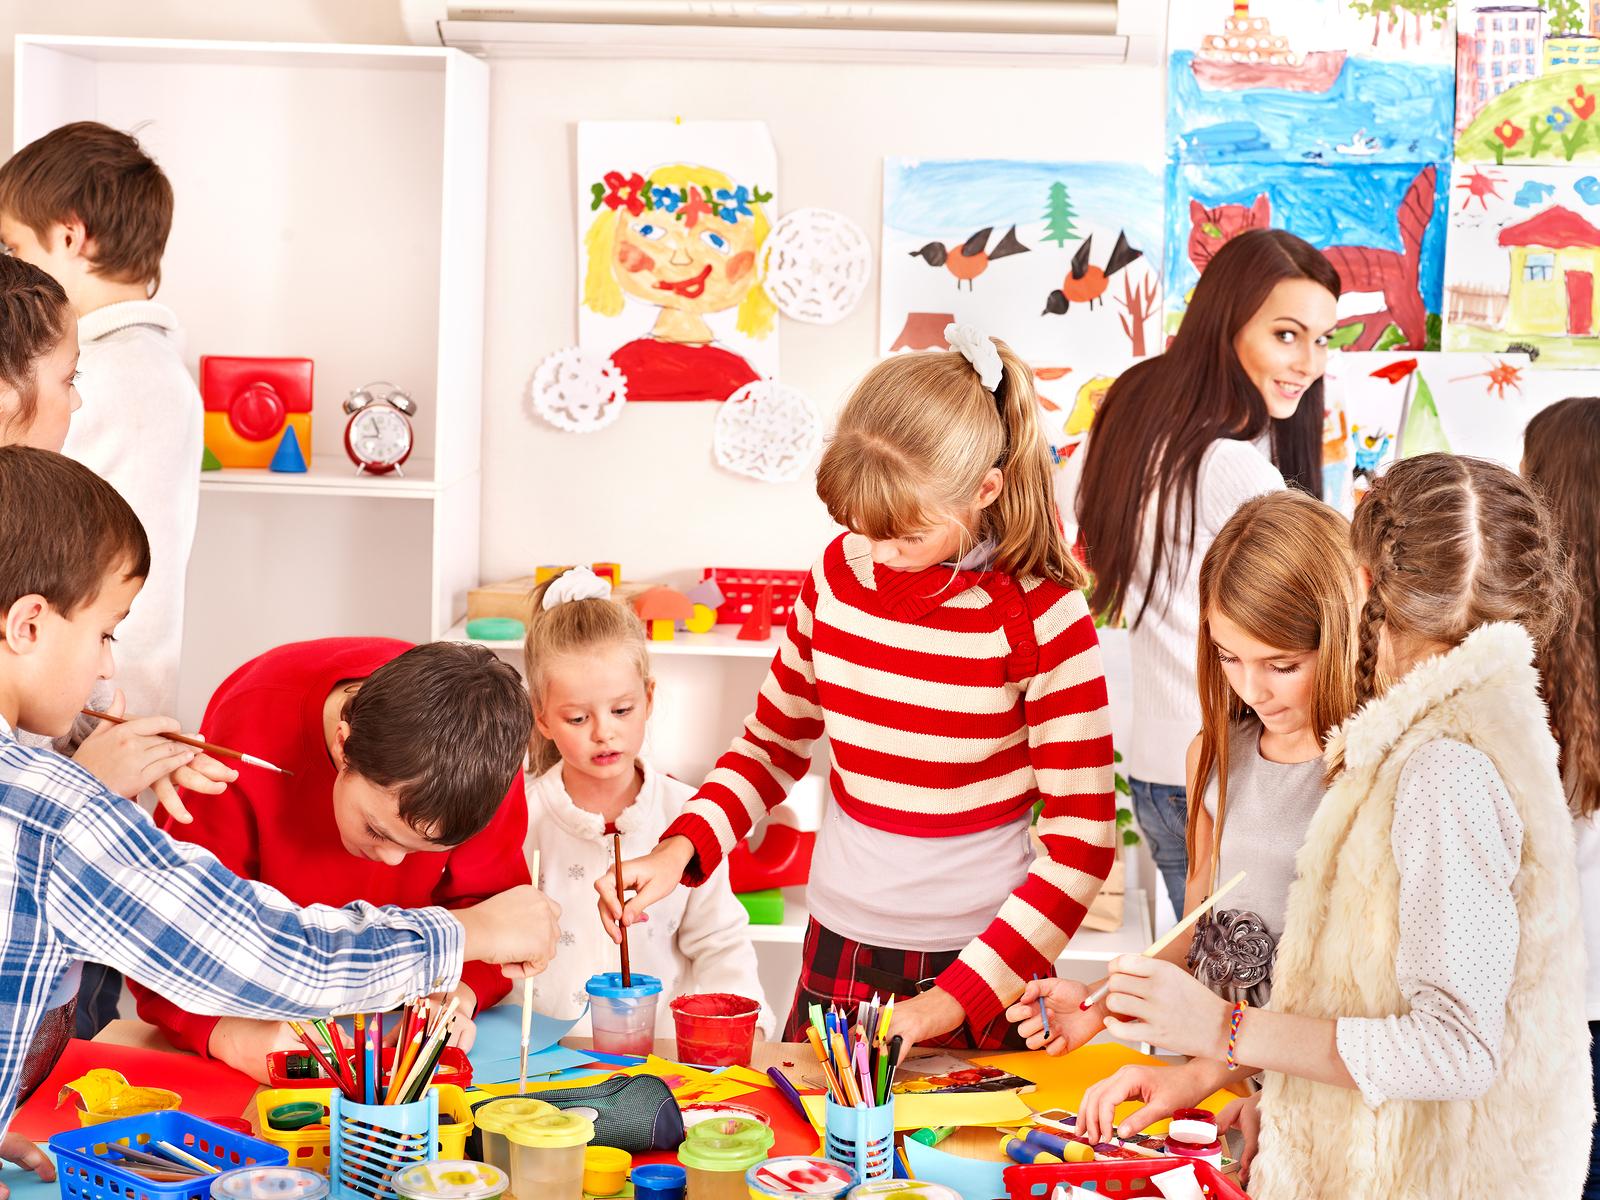 bigstock-Child-painting-at-art-school--39175162